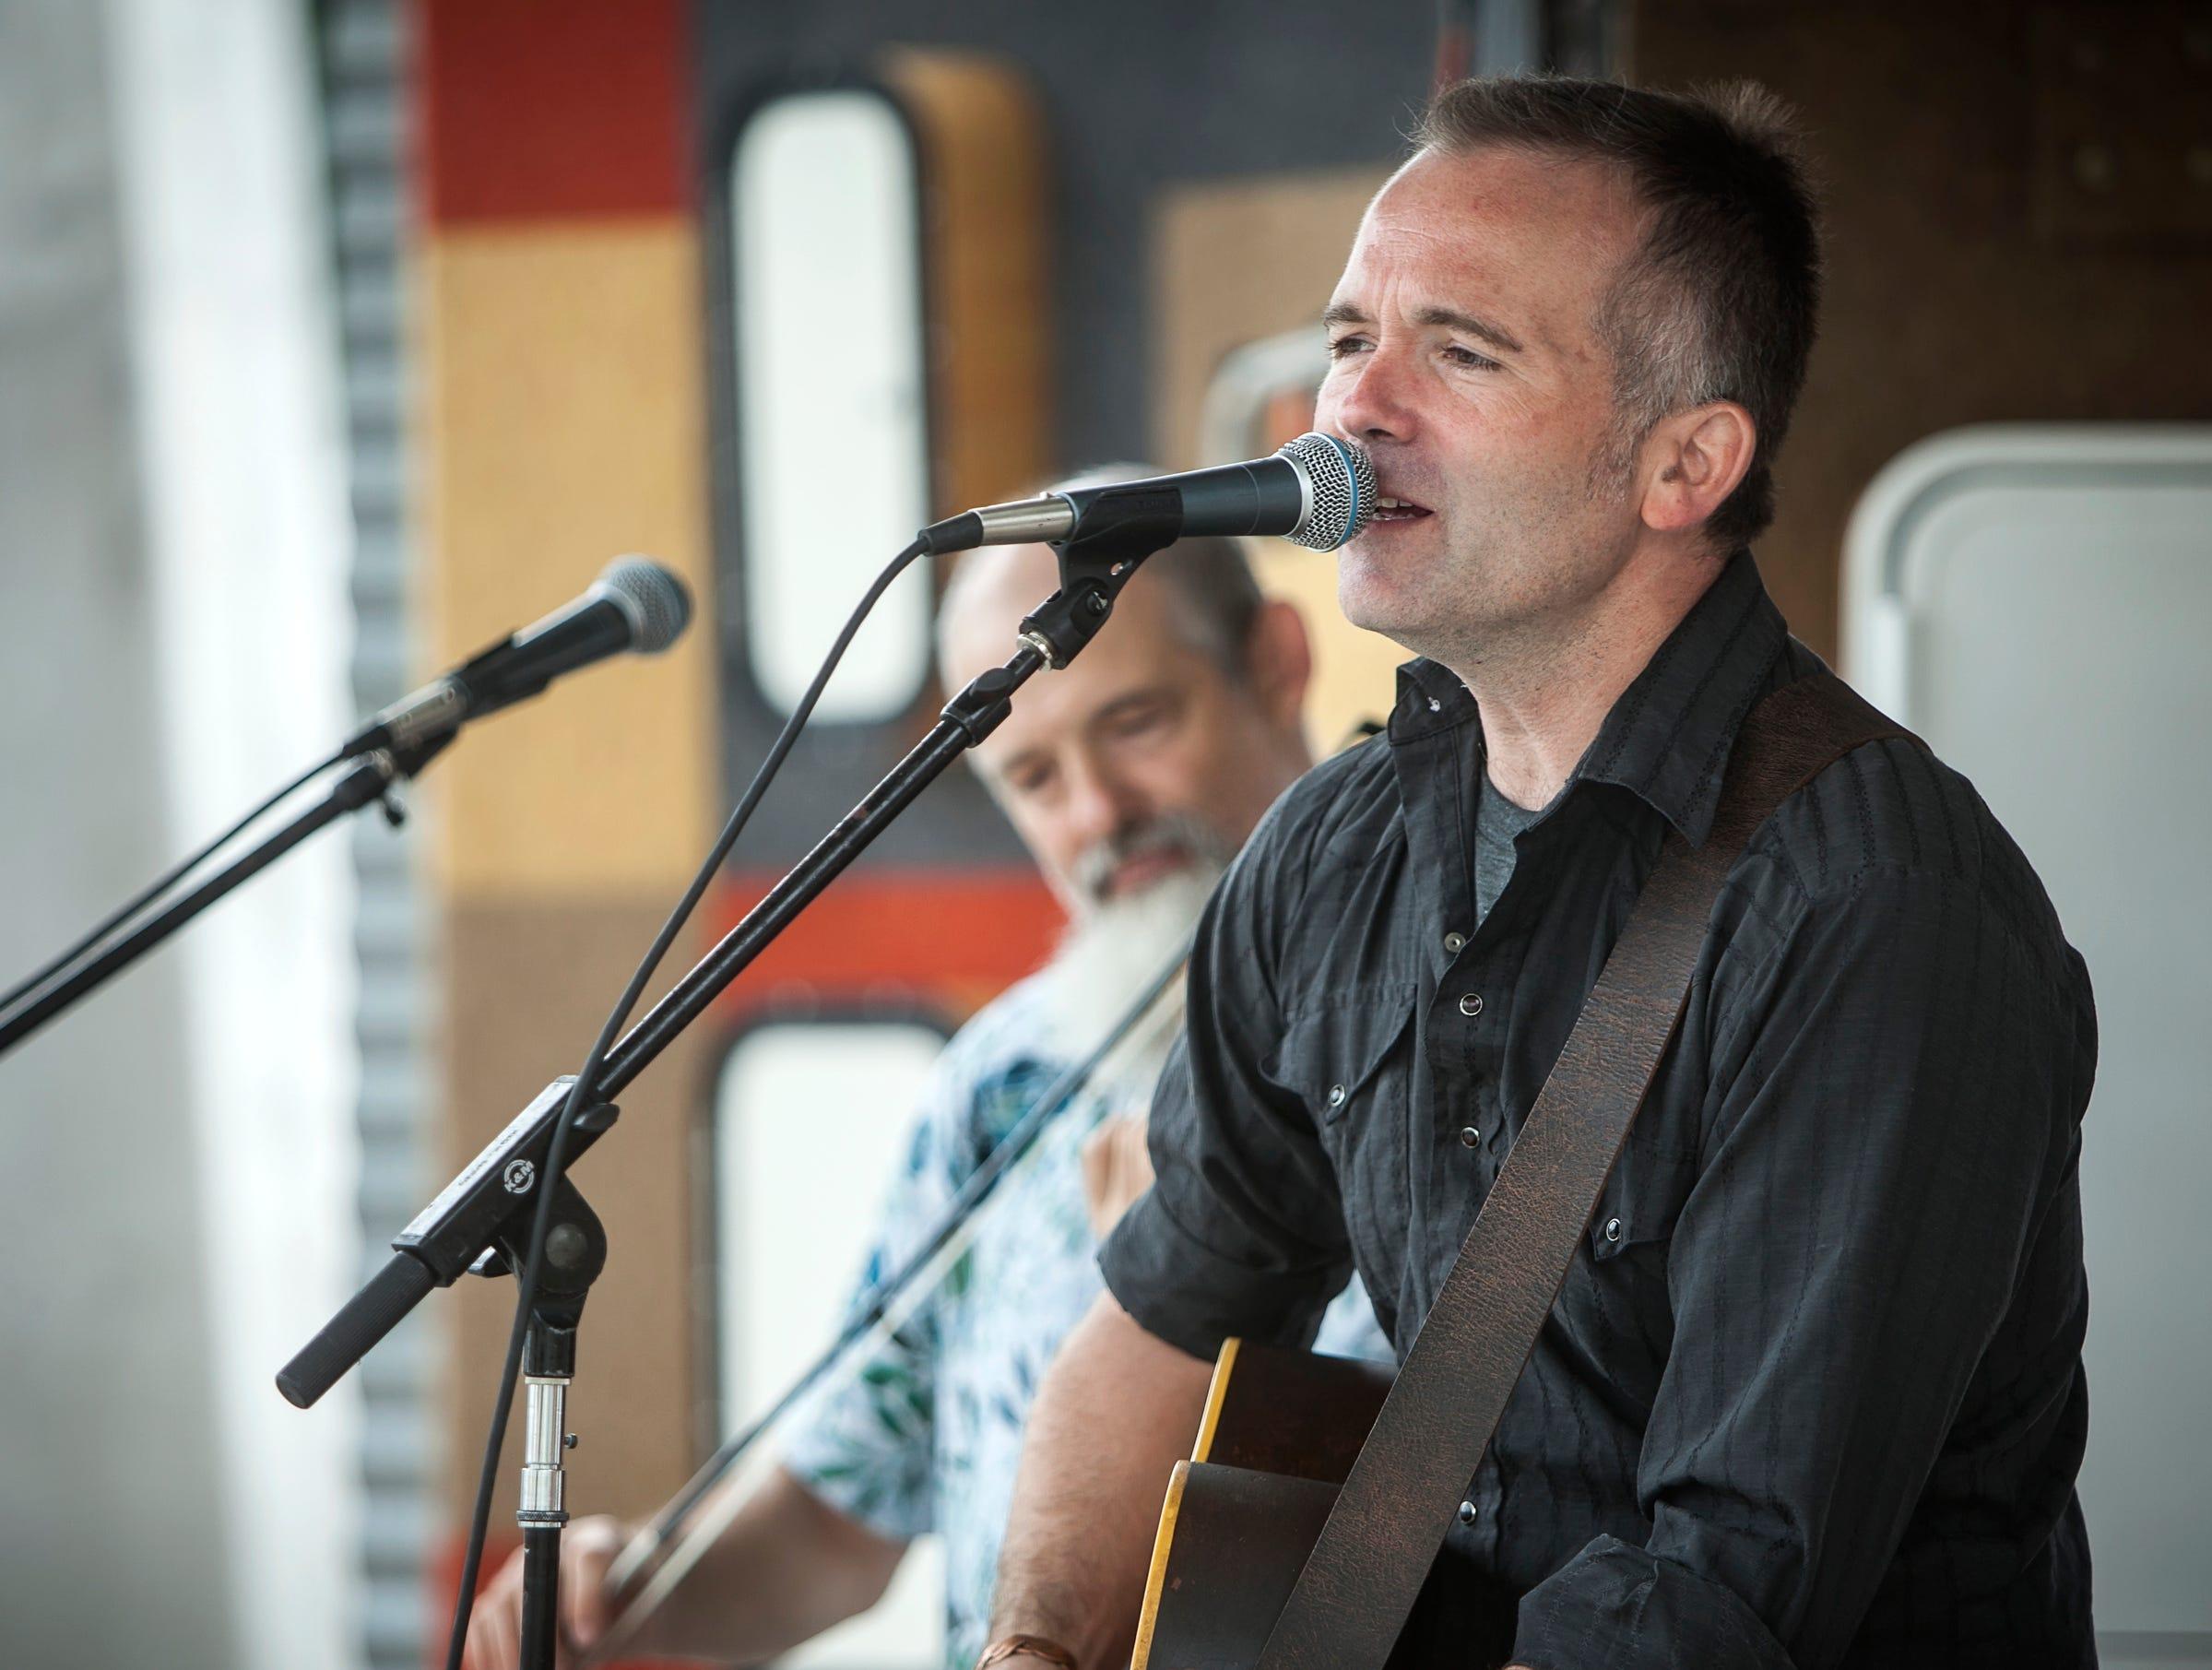 Josh Harty Band at the Midsummer Festival of the Arts outside the John Michael Kohler Arts Center in Sheboygan on July 21.